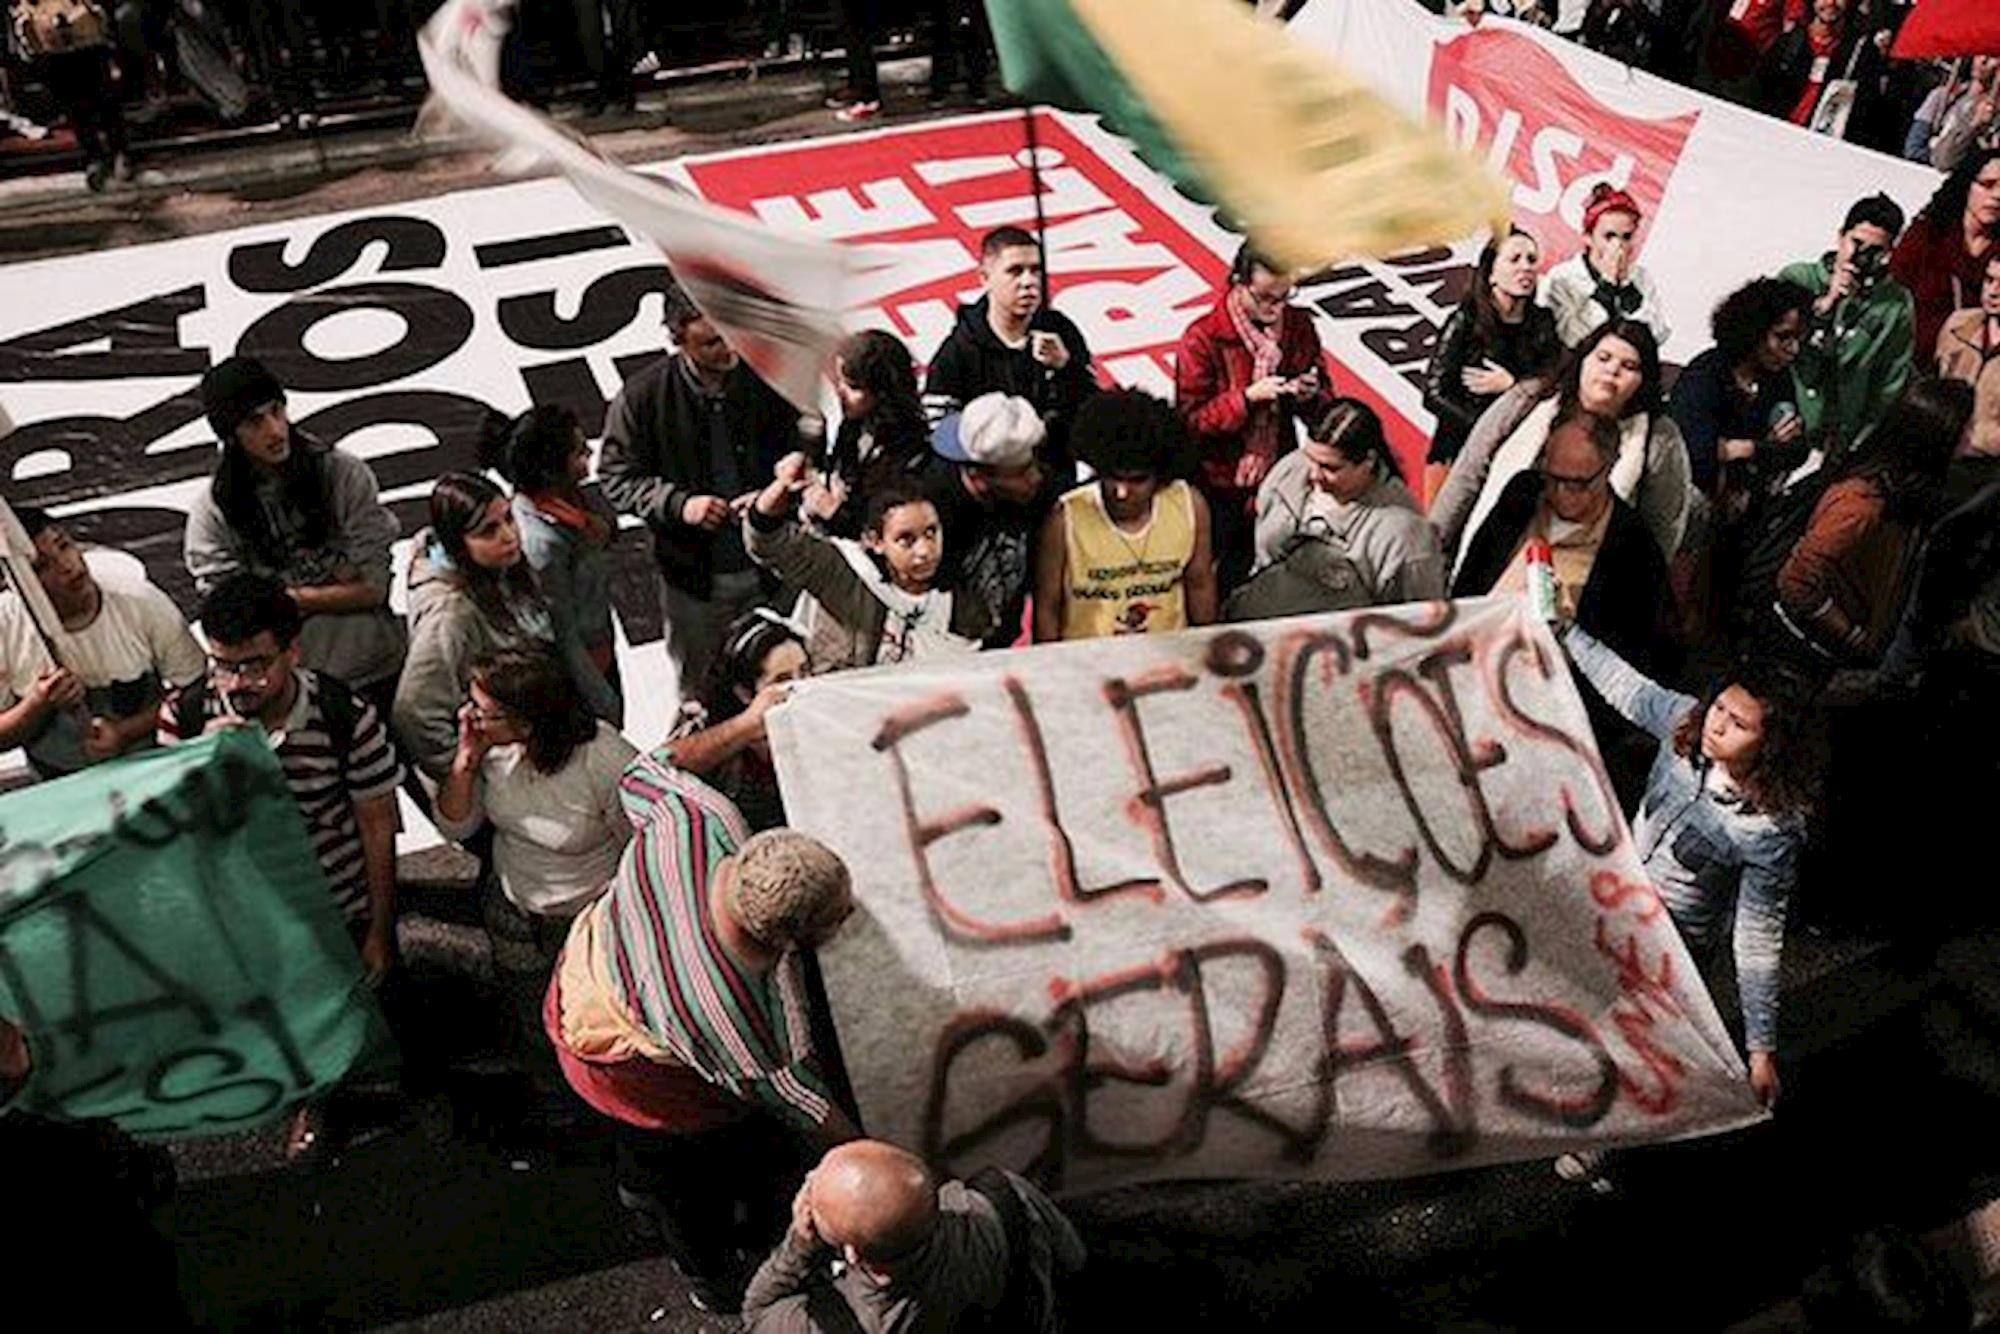 Brasil de Fato, protesto, diretas já, diretas, reformas, Reprodução Brasil de Fato